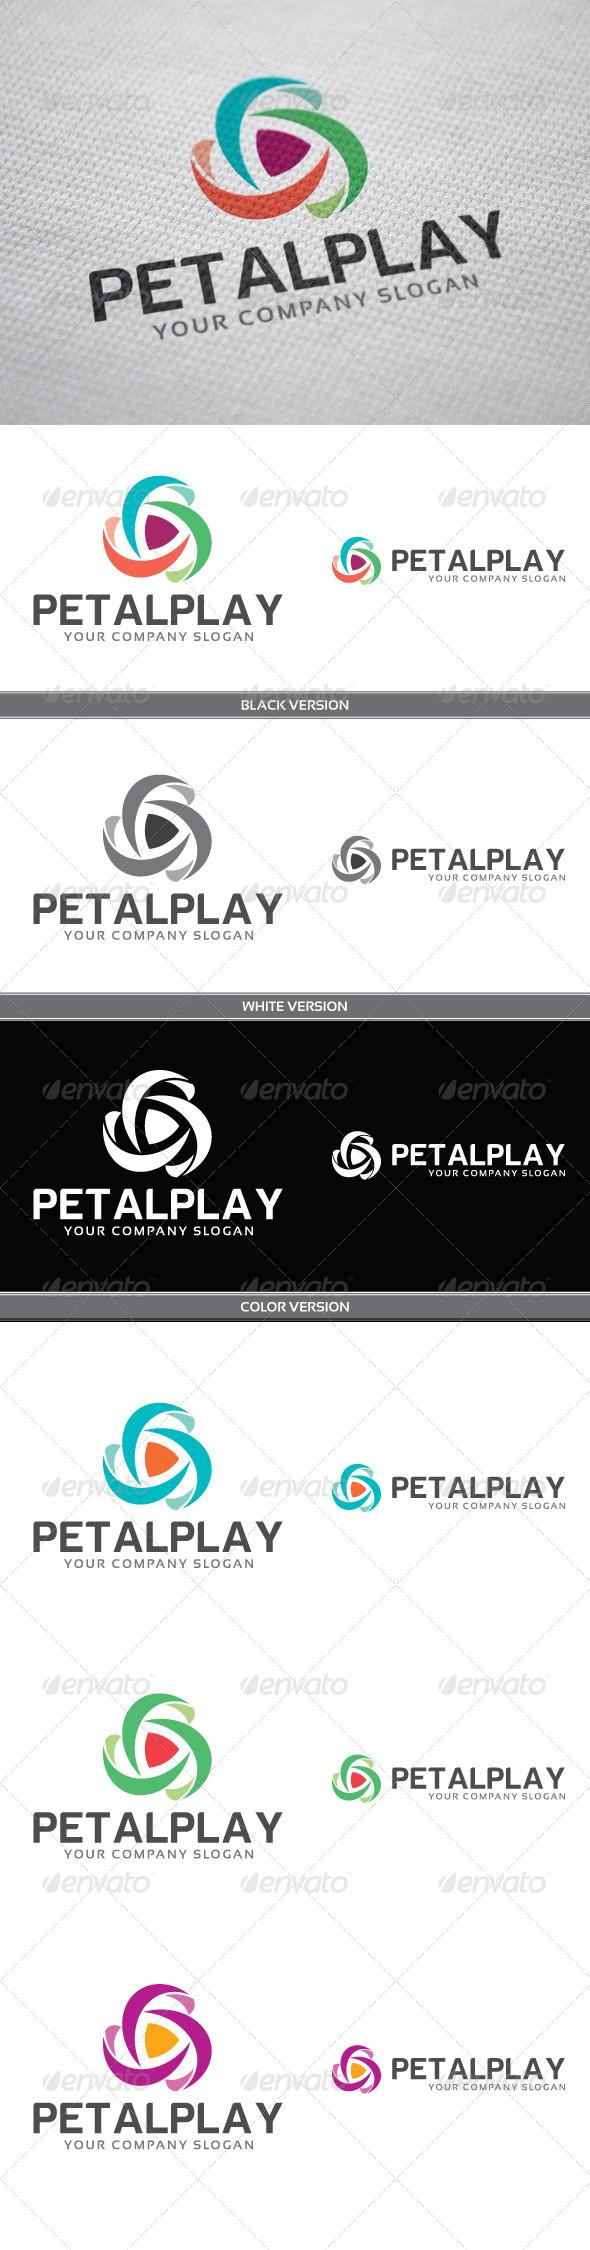 PetalPlay - Symbols Logo Templates